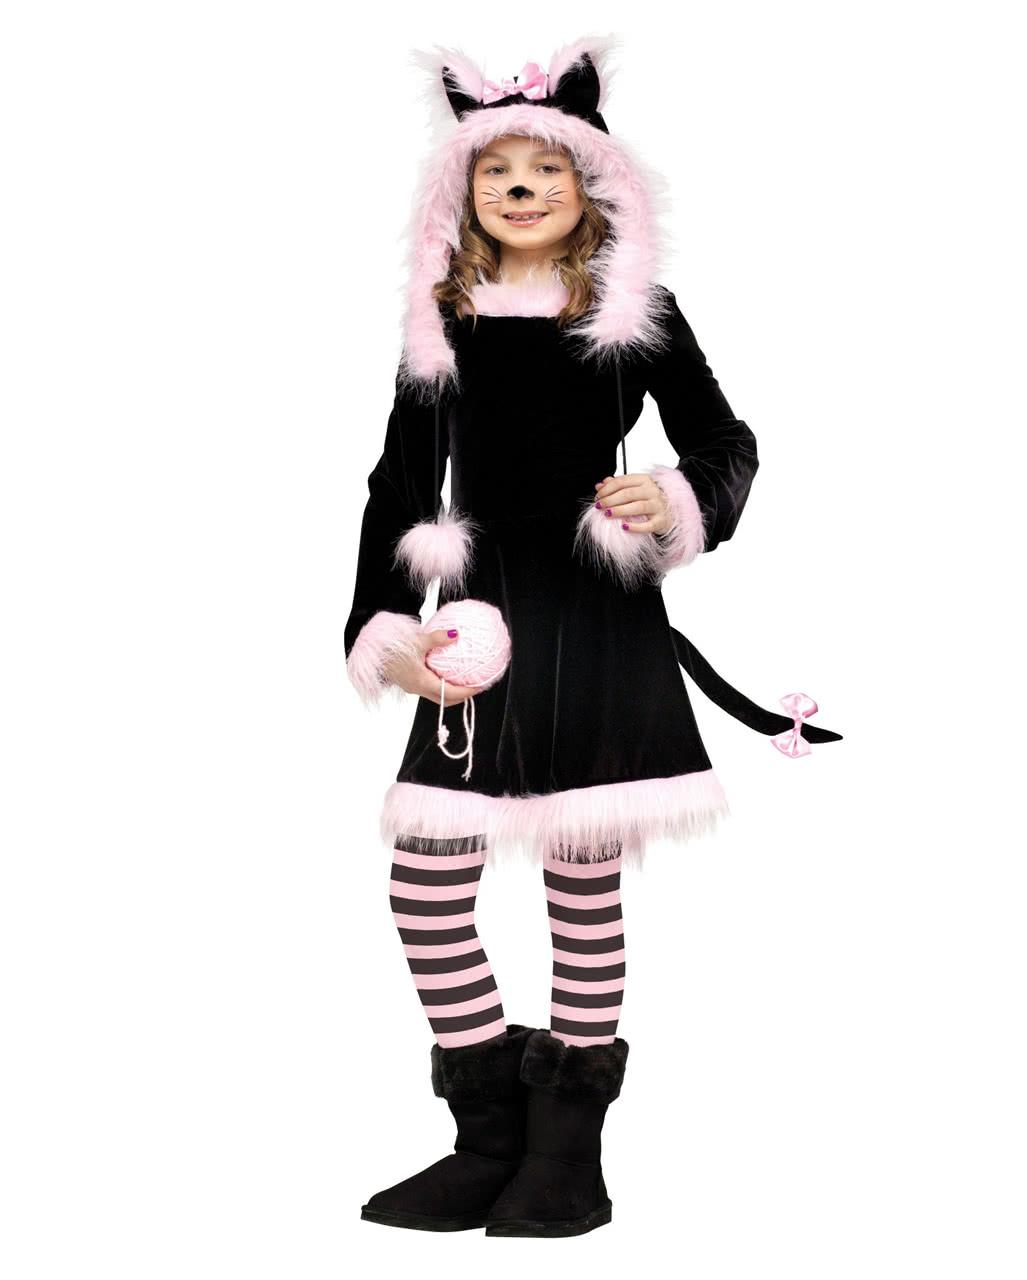 Susses Katzen Kostum Fur Kinder An Fasching Karneval Universe